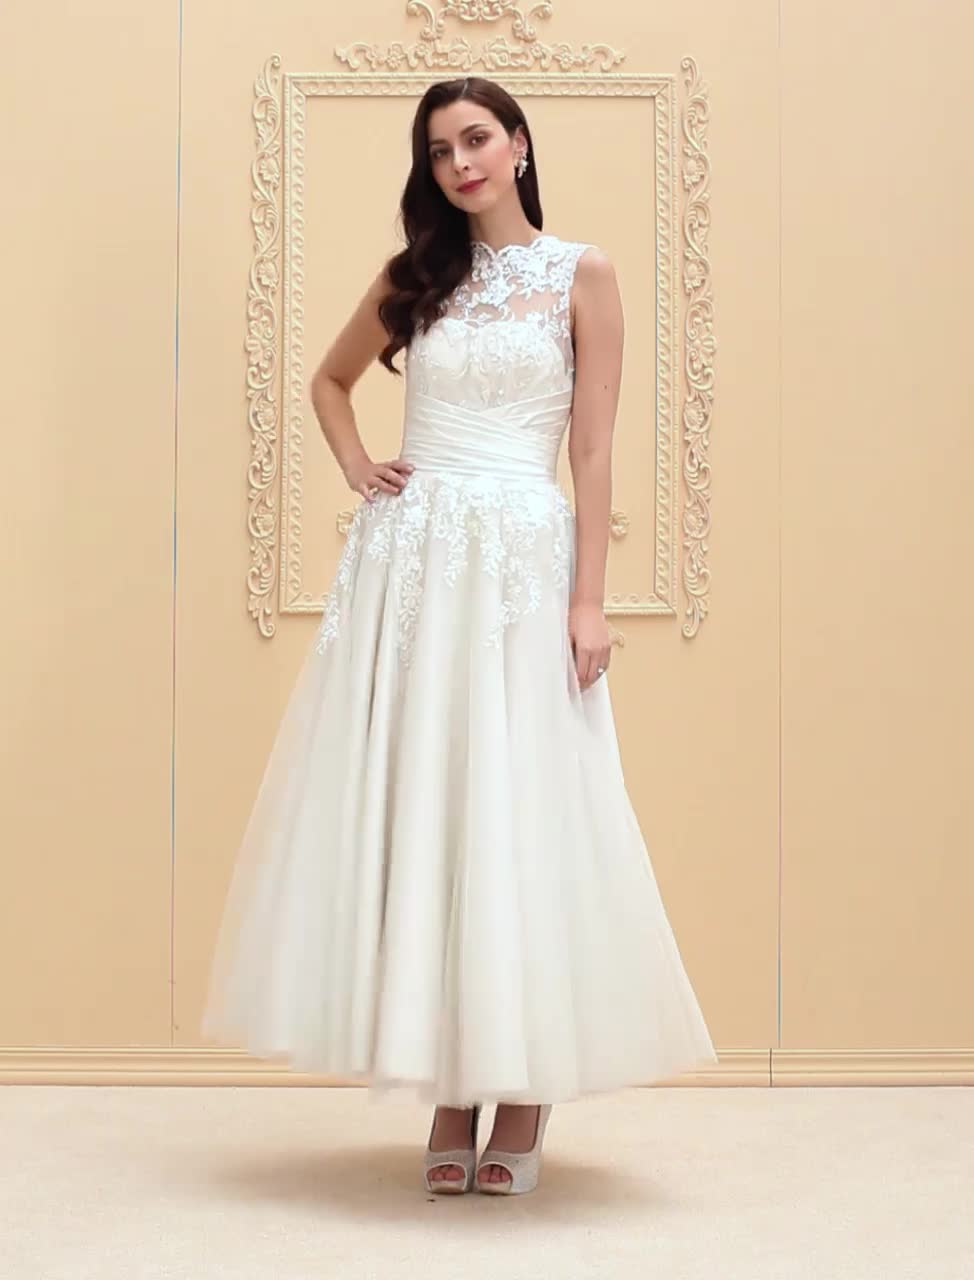 algerian wedding dress » Wedding Dresses Designs, Ideas and Photos ...